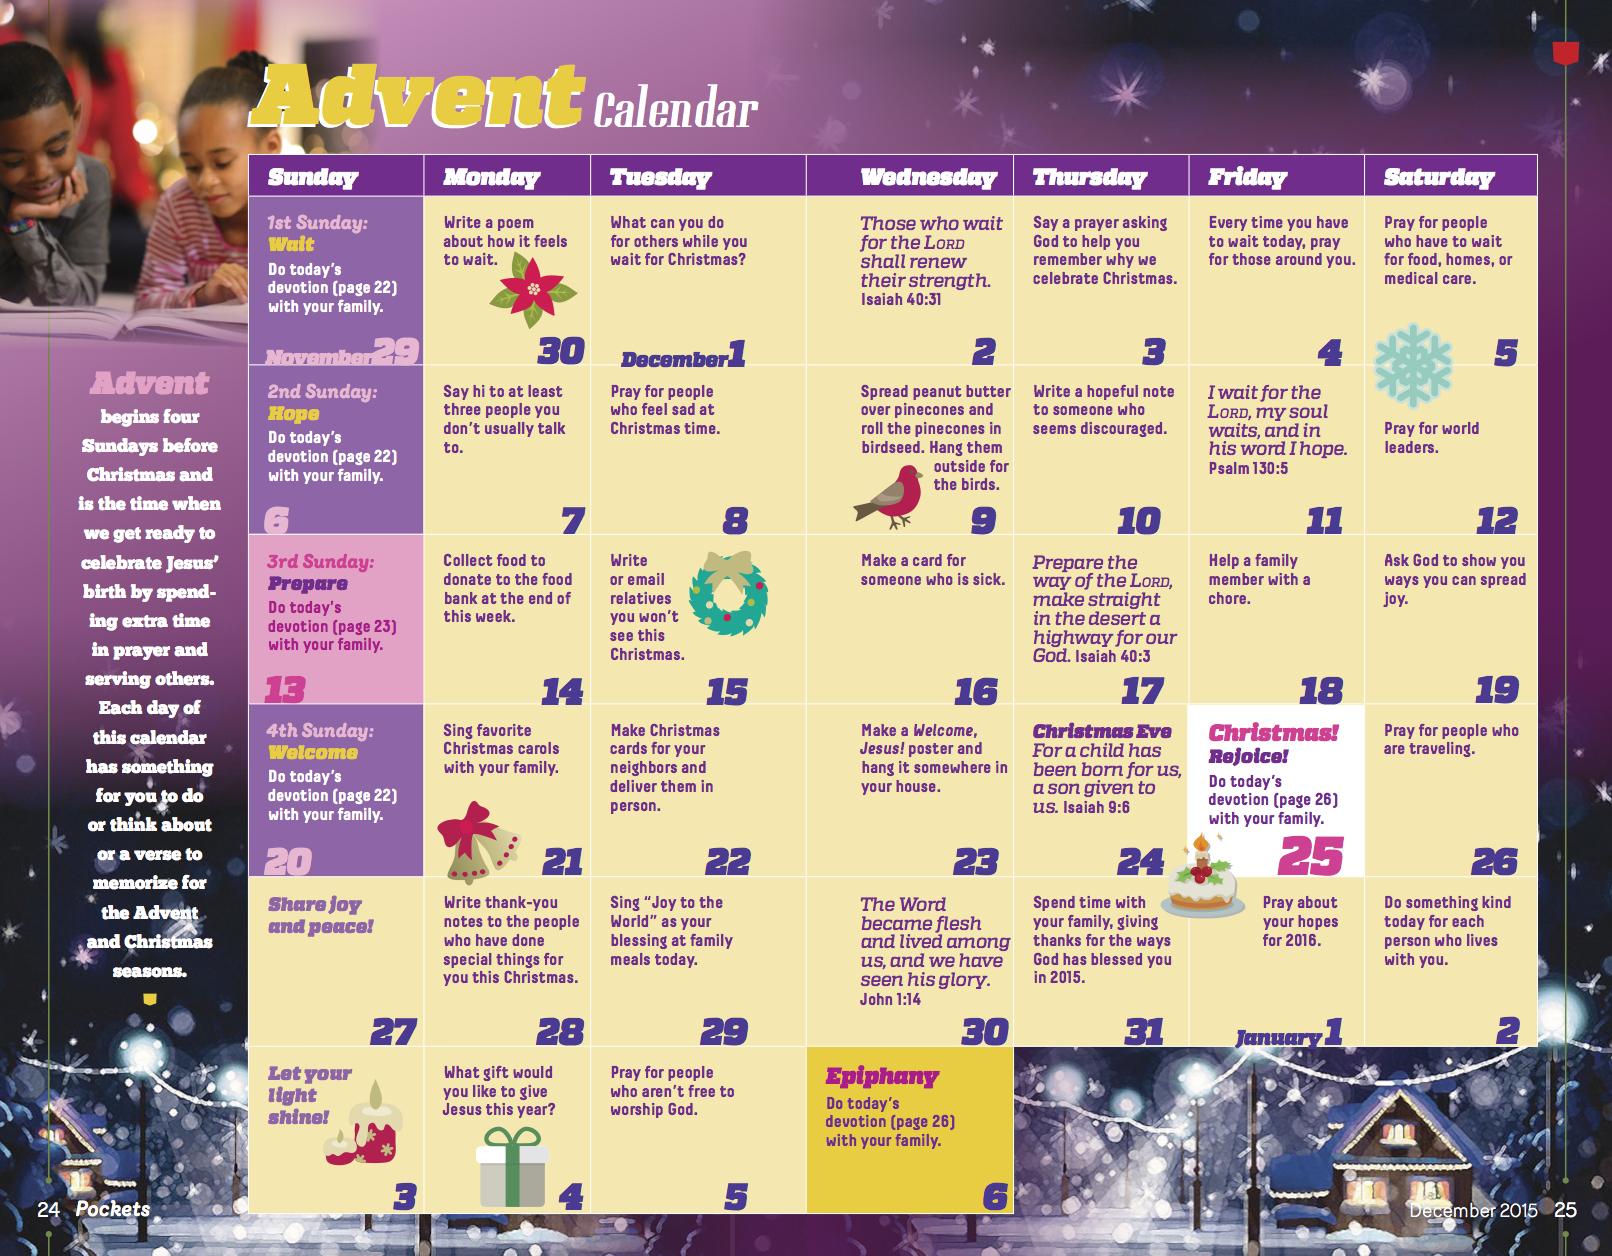 Pockets Advent Calendar Discipleship Ministries